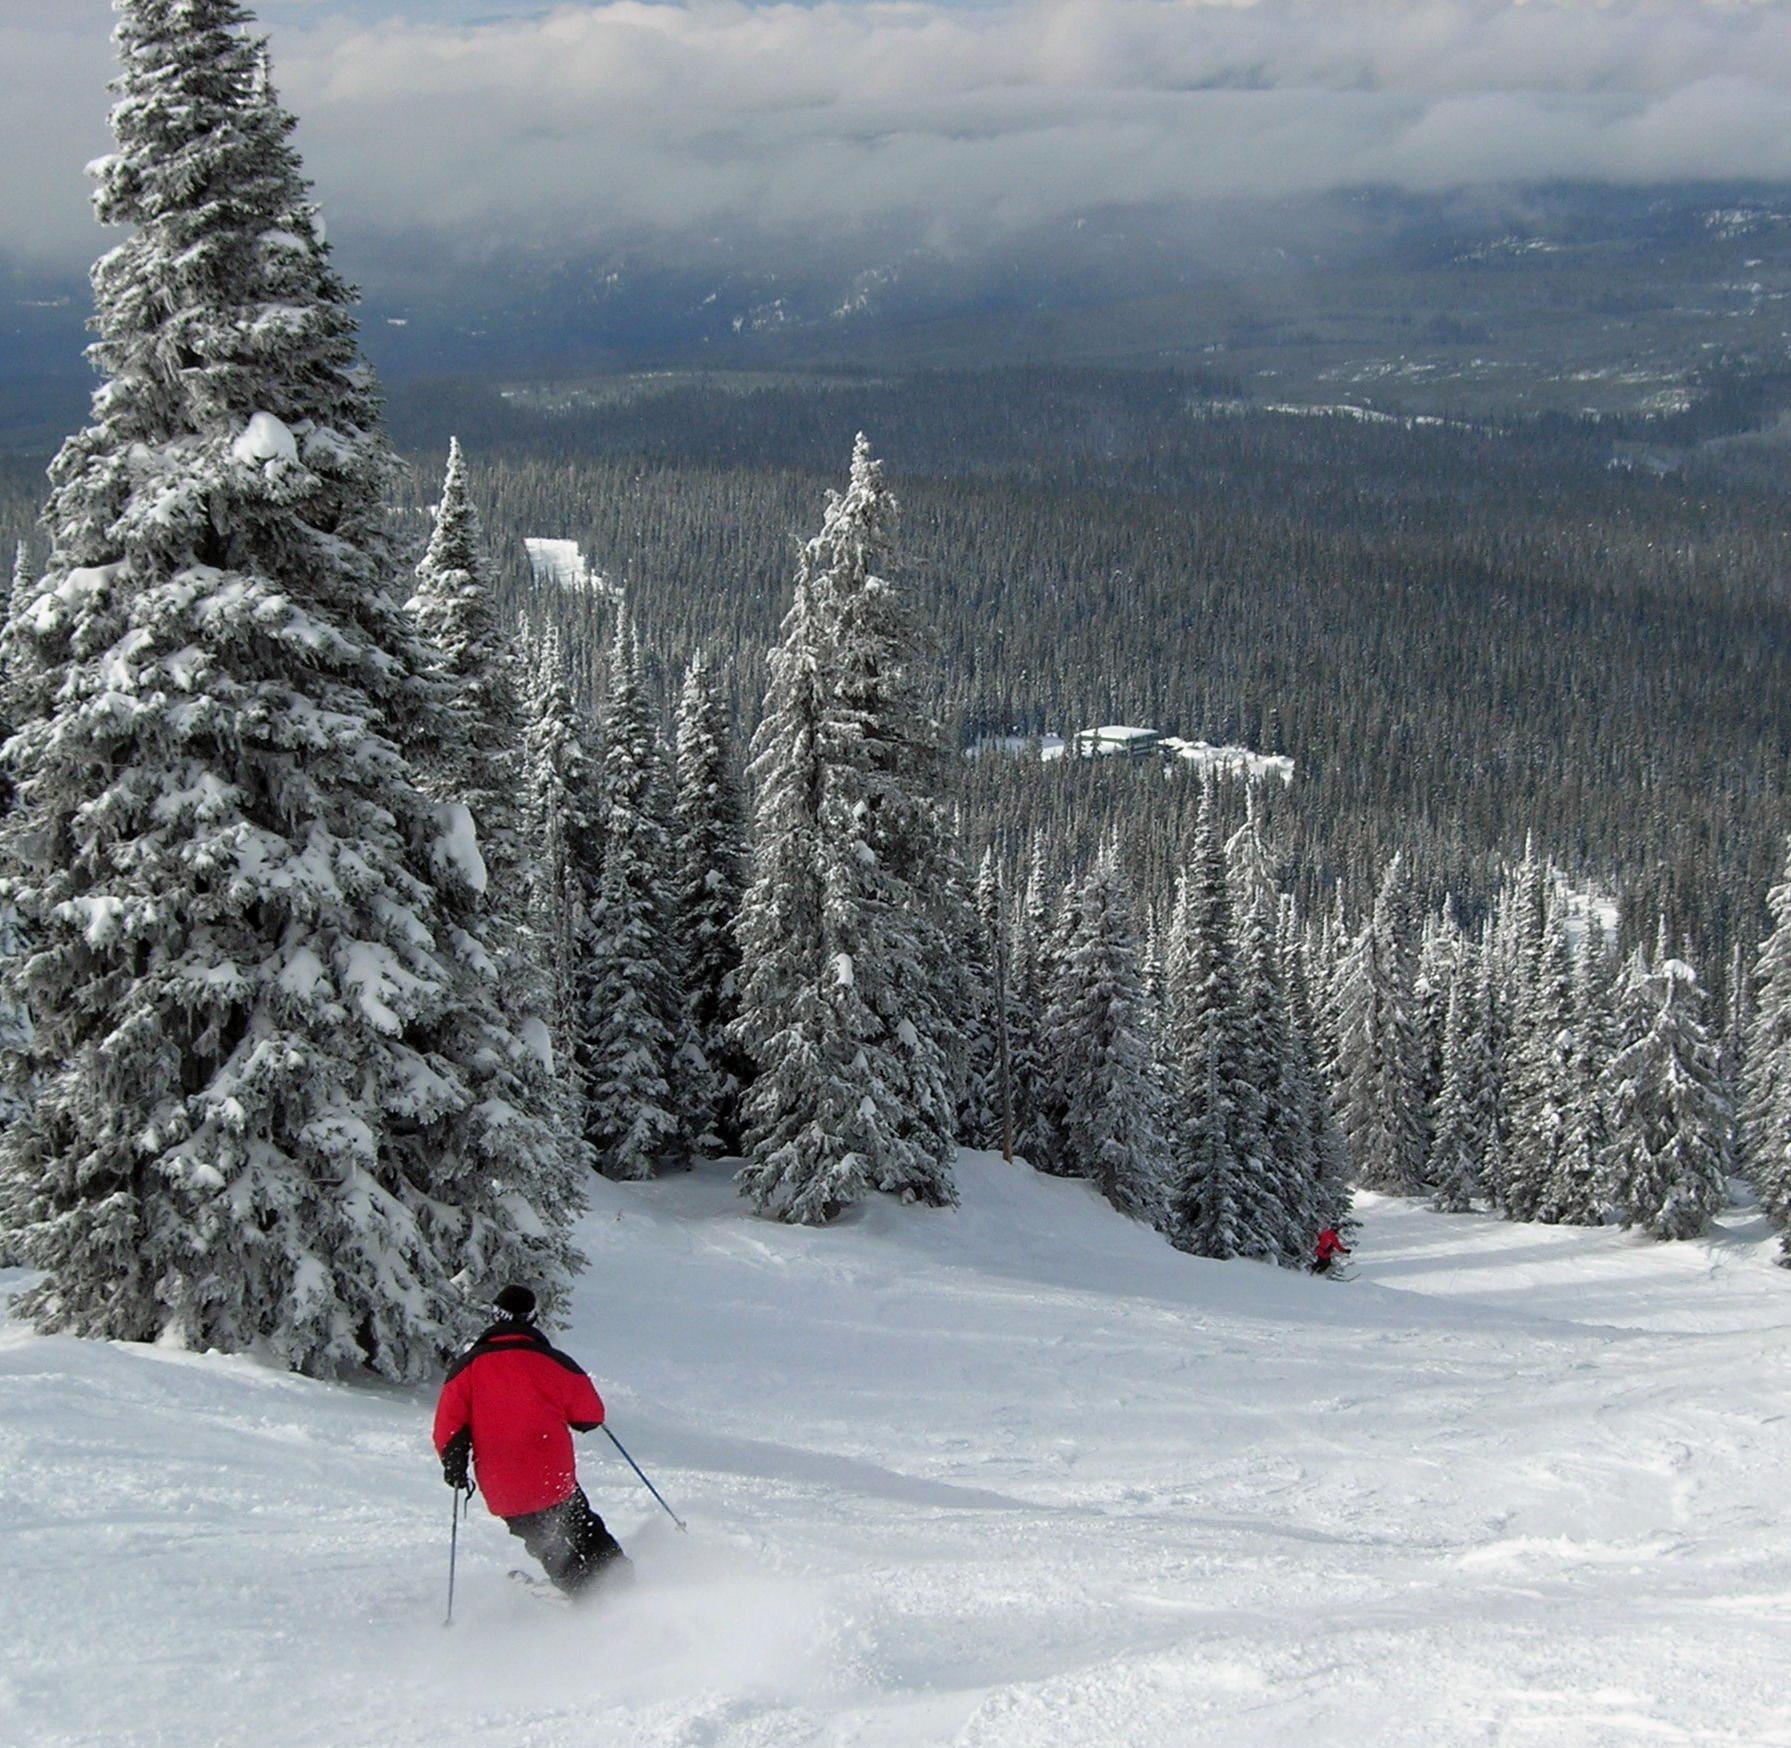 Three Area Ski Swaps Offer Big Savings for Winter Fun